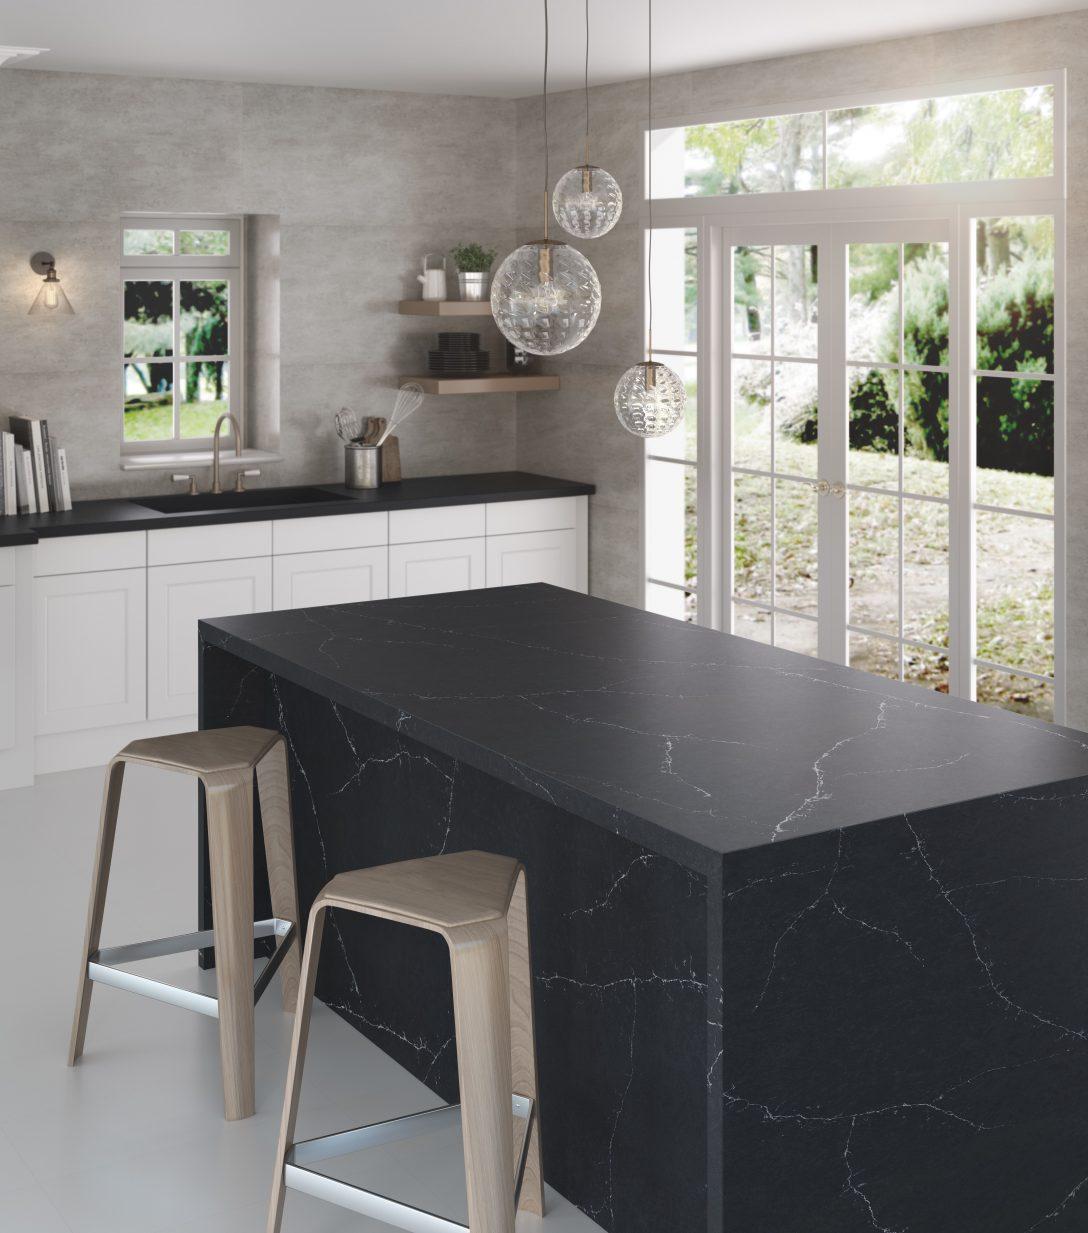 Large Size of Bodenbelag Küche Altbau Bodenbelag In Der Küche Boden Für Küche Küchenboden Ideen Küche Bodenbelag Küche